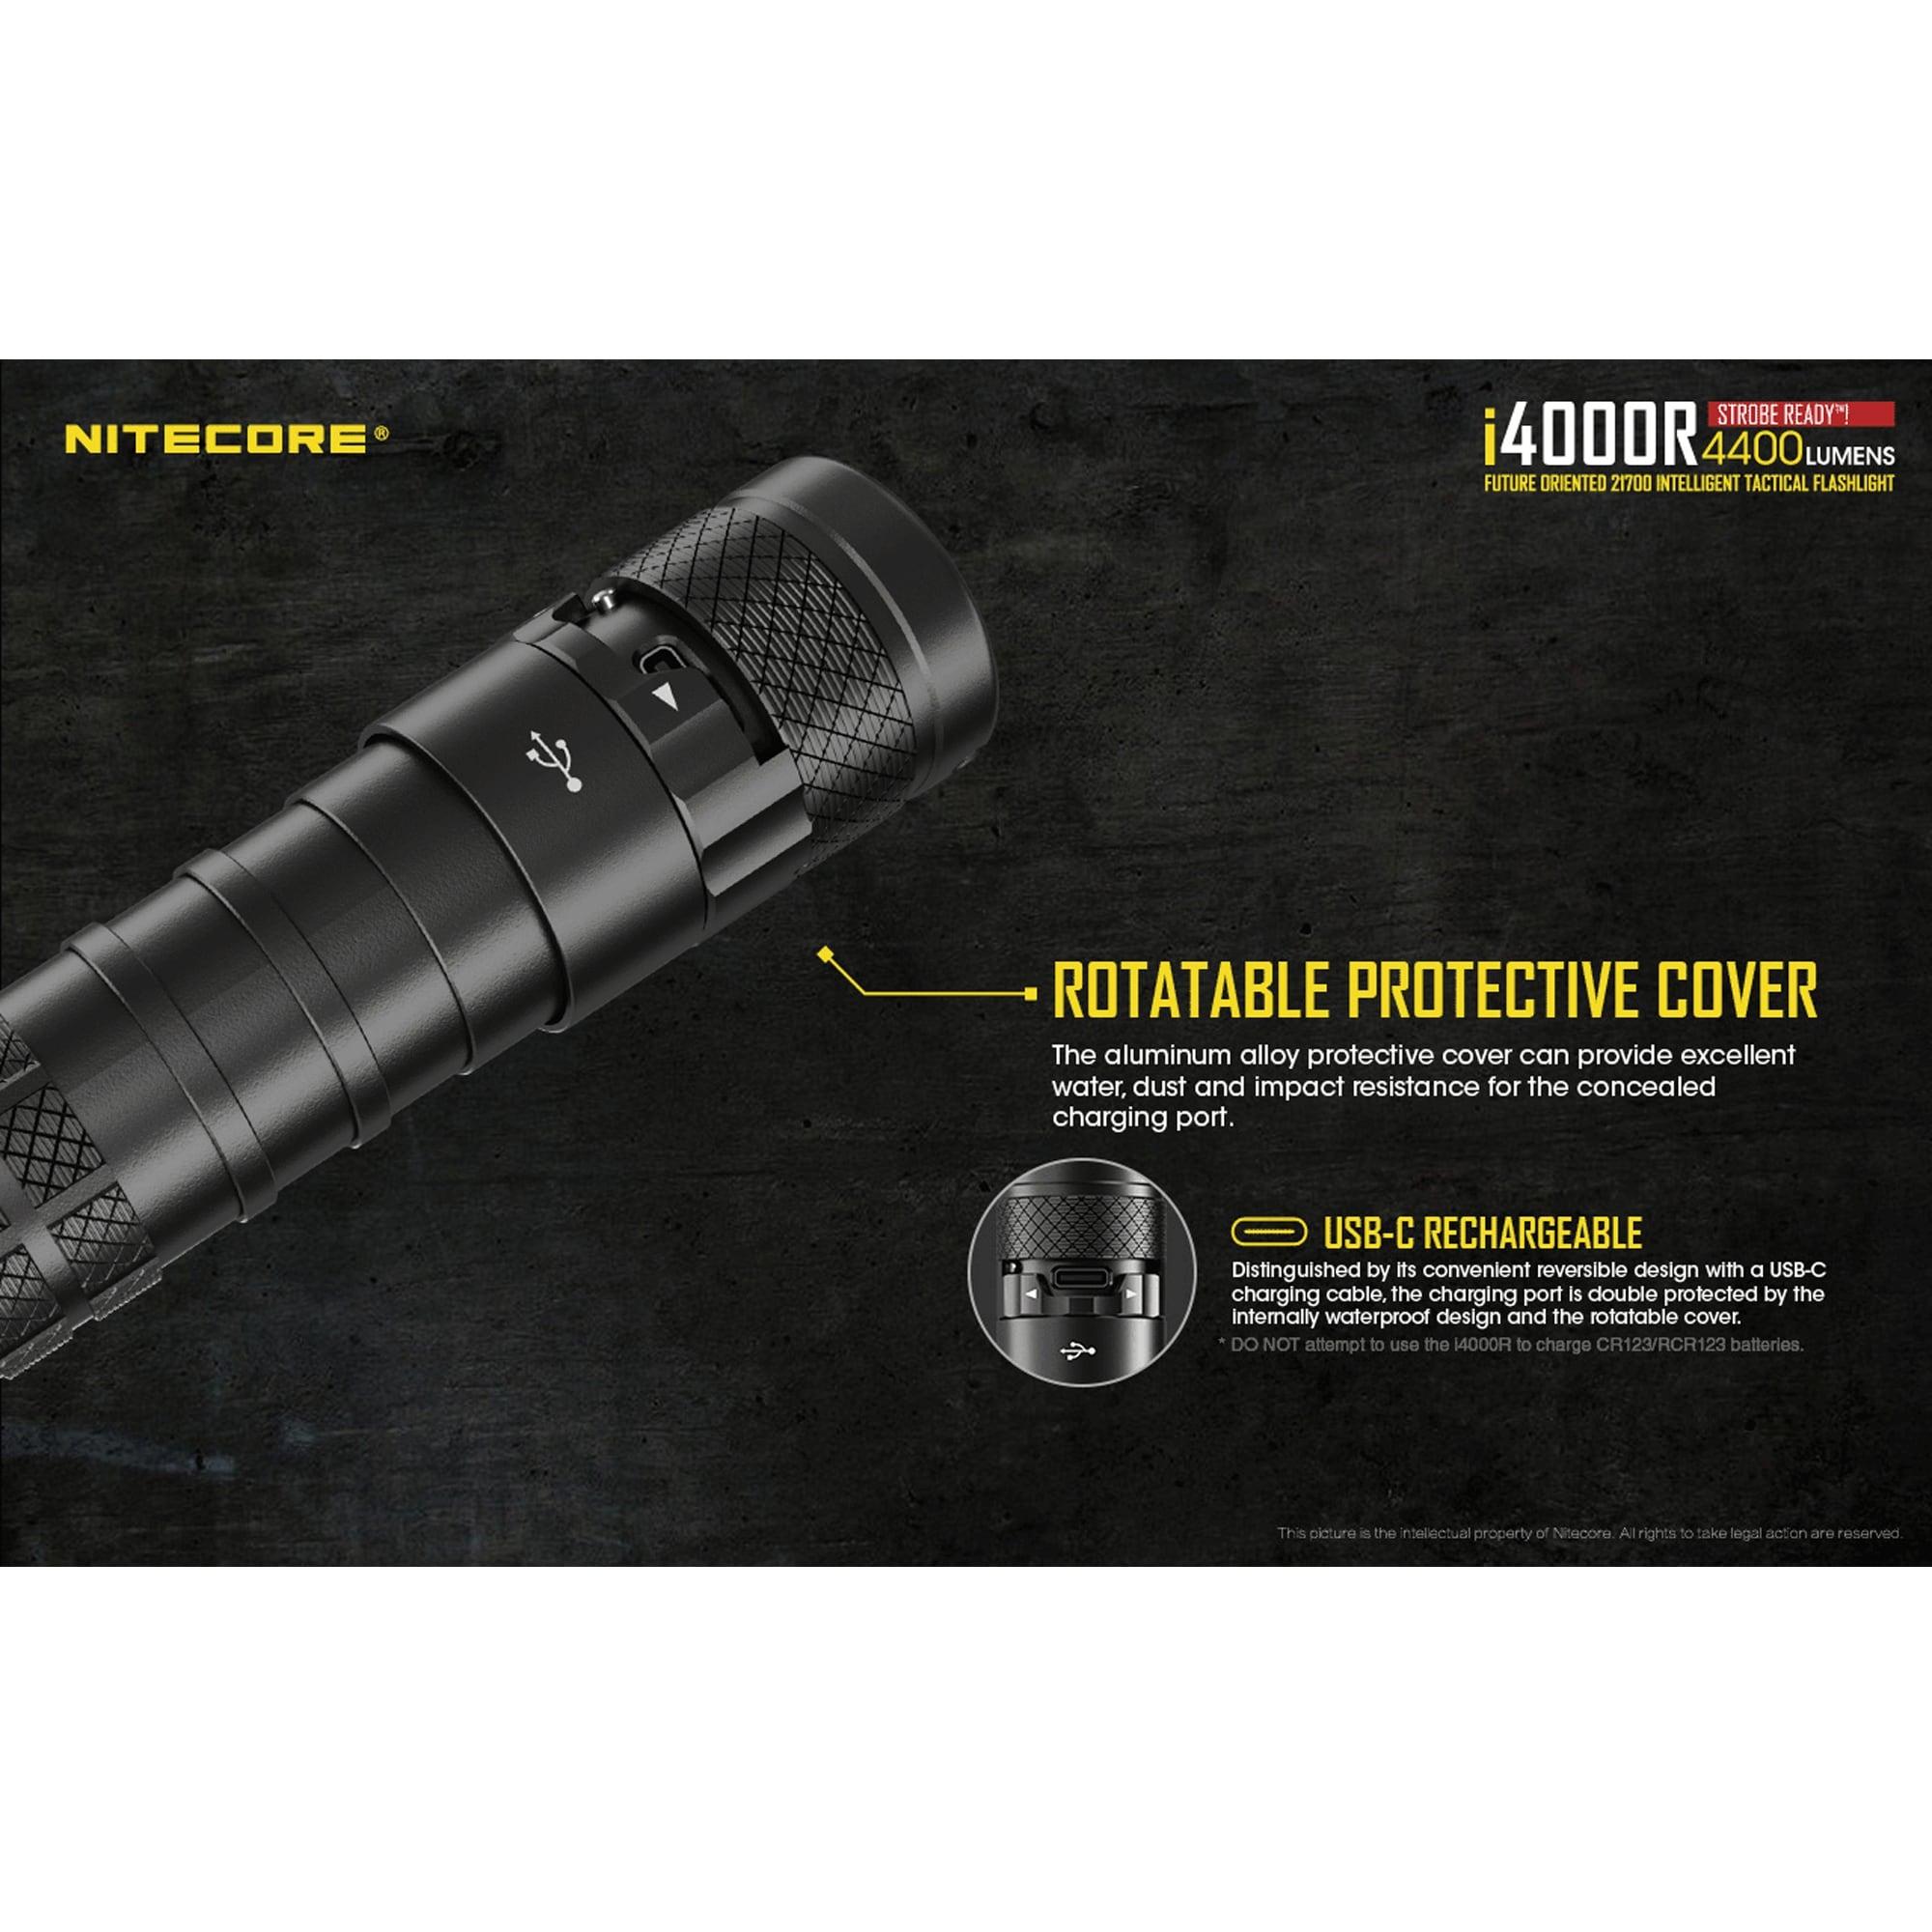 NITECORE i4000R 4400 Lumen USB-C Rechargeable Tactical Flashlight